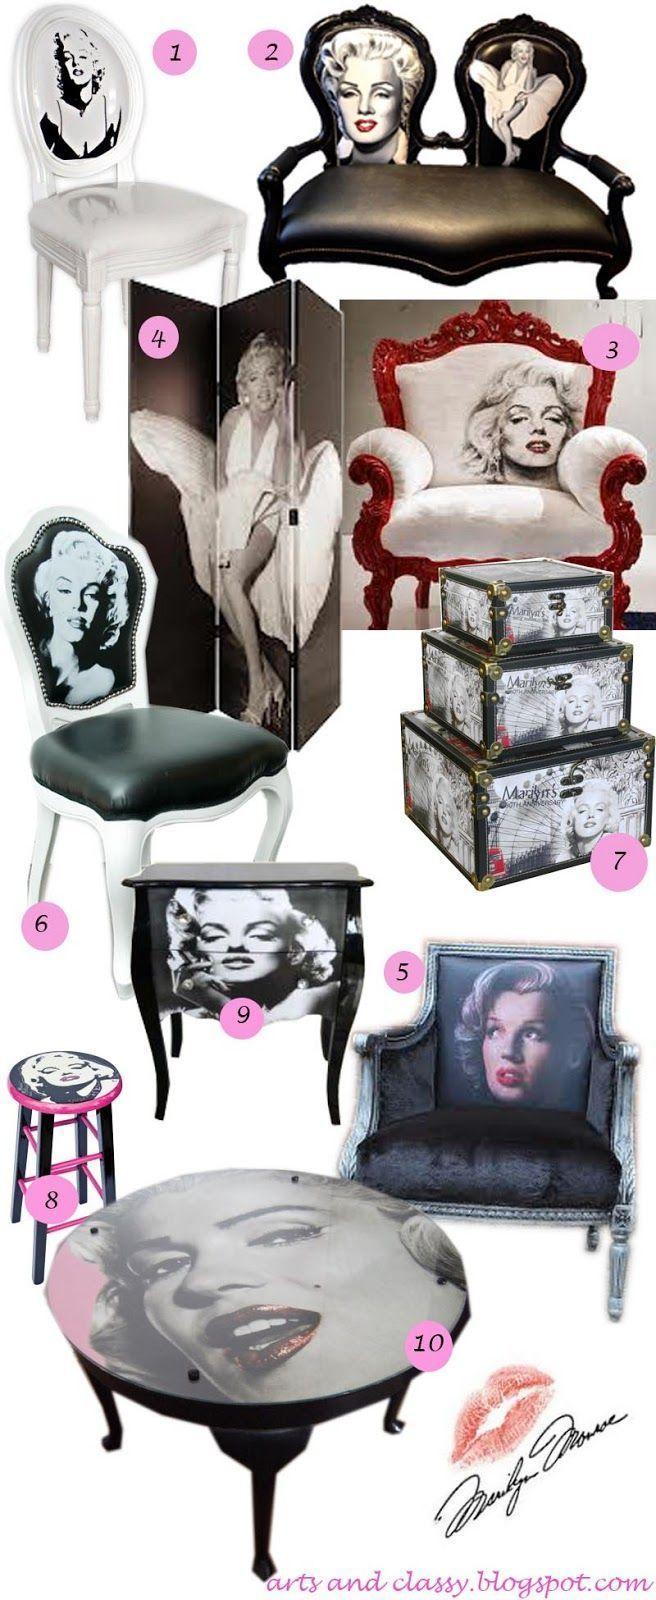 Best 25+ Marilyn monroe decor ideas on Pinterest | Marilyn ...